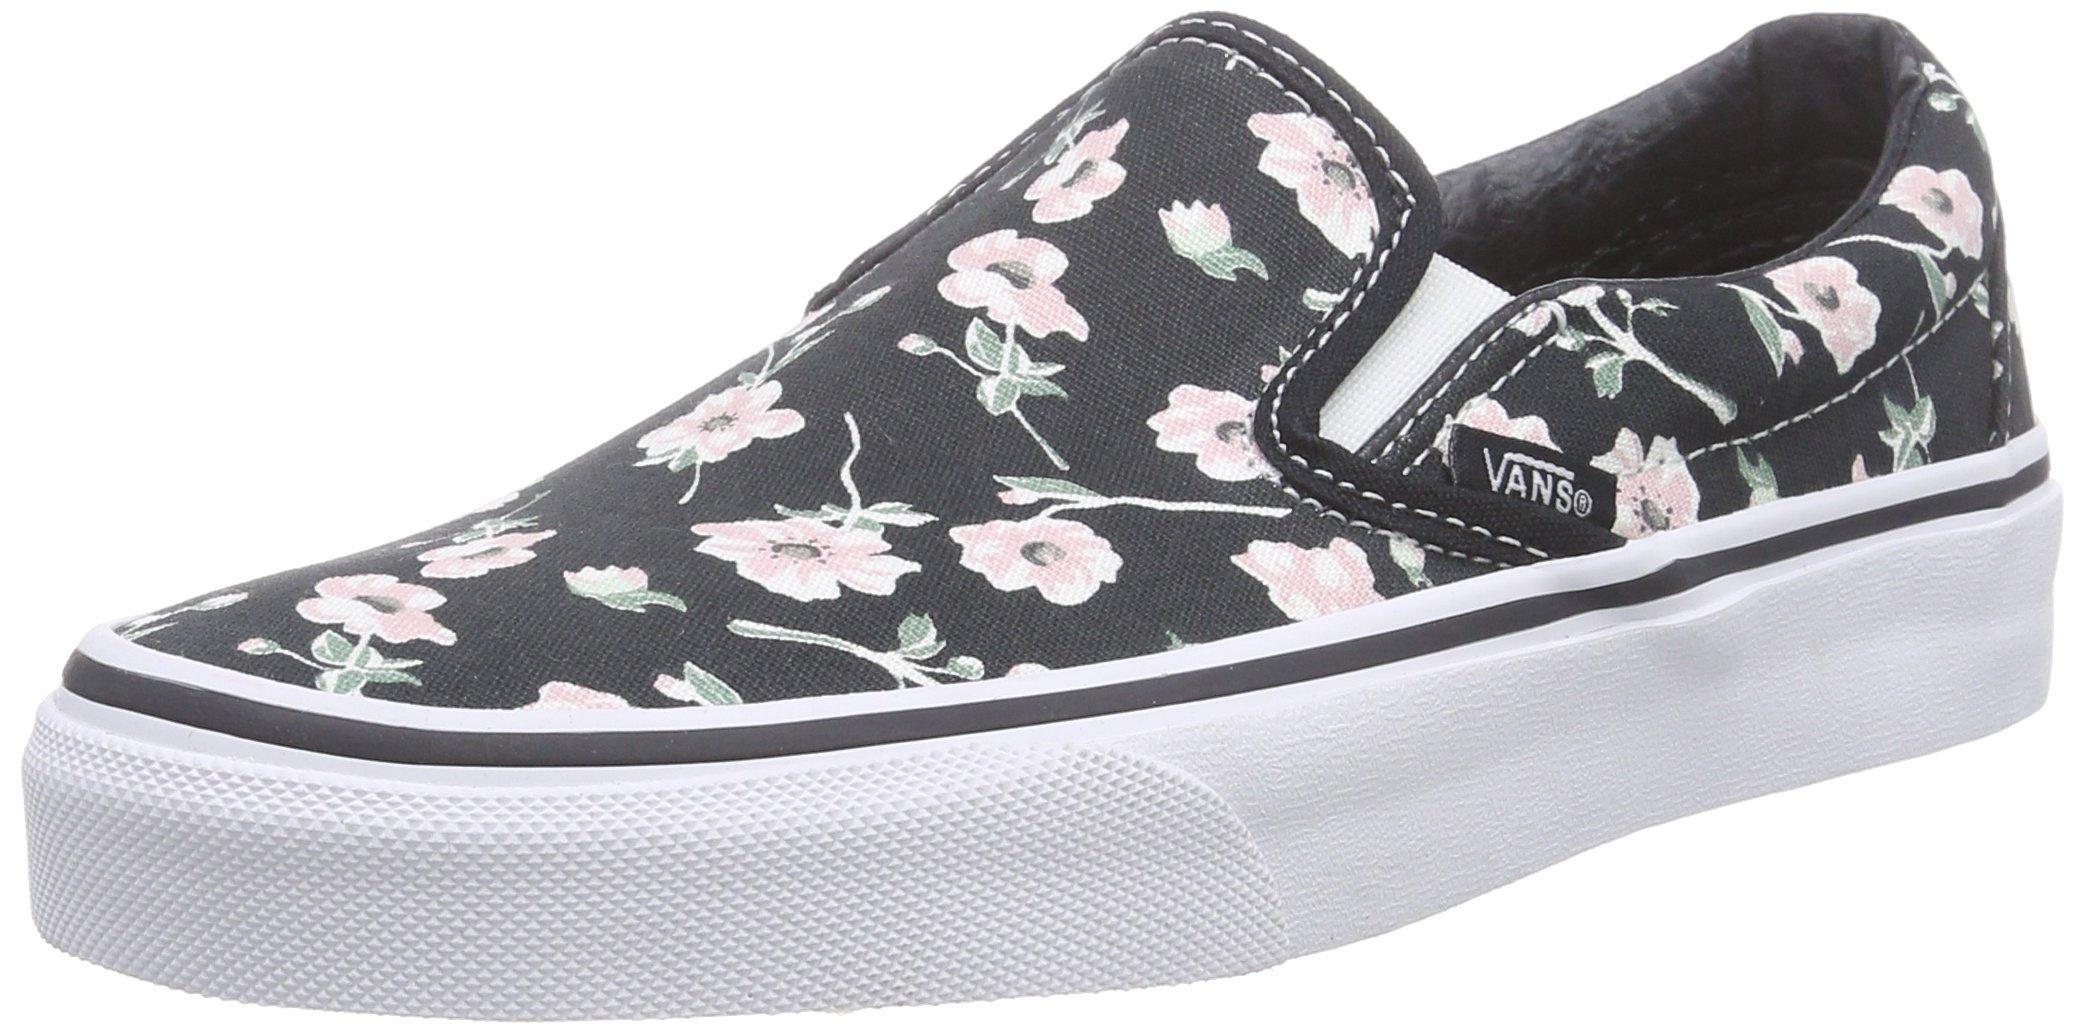 9baa076ca7 Galleon - Vans Unisex Classic Slip-On Skate Shoe (Vintage Floral-Bigrphite,  6 Womens / 4.5 Men US)